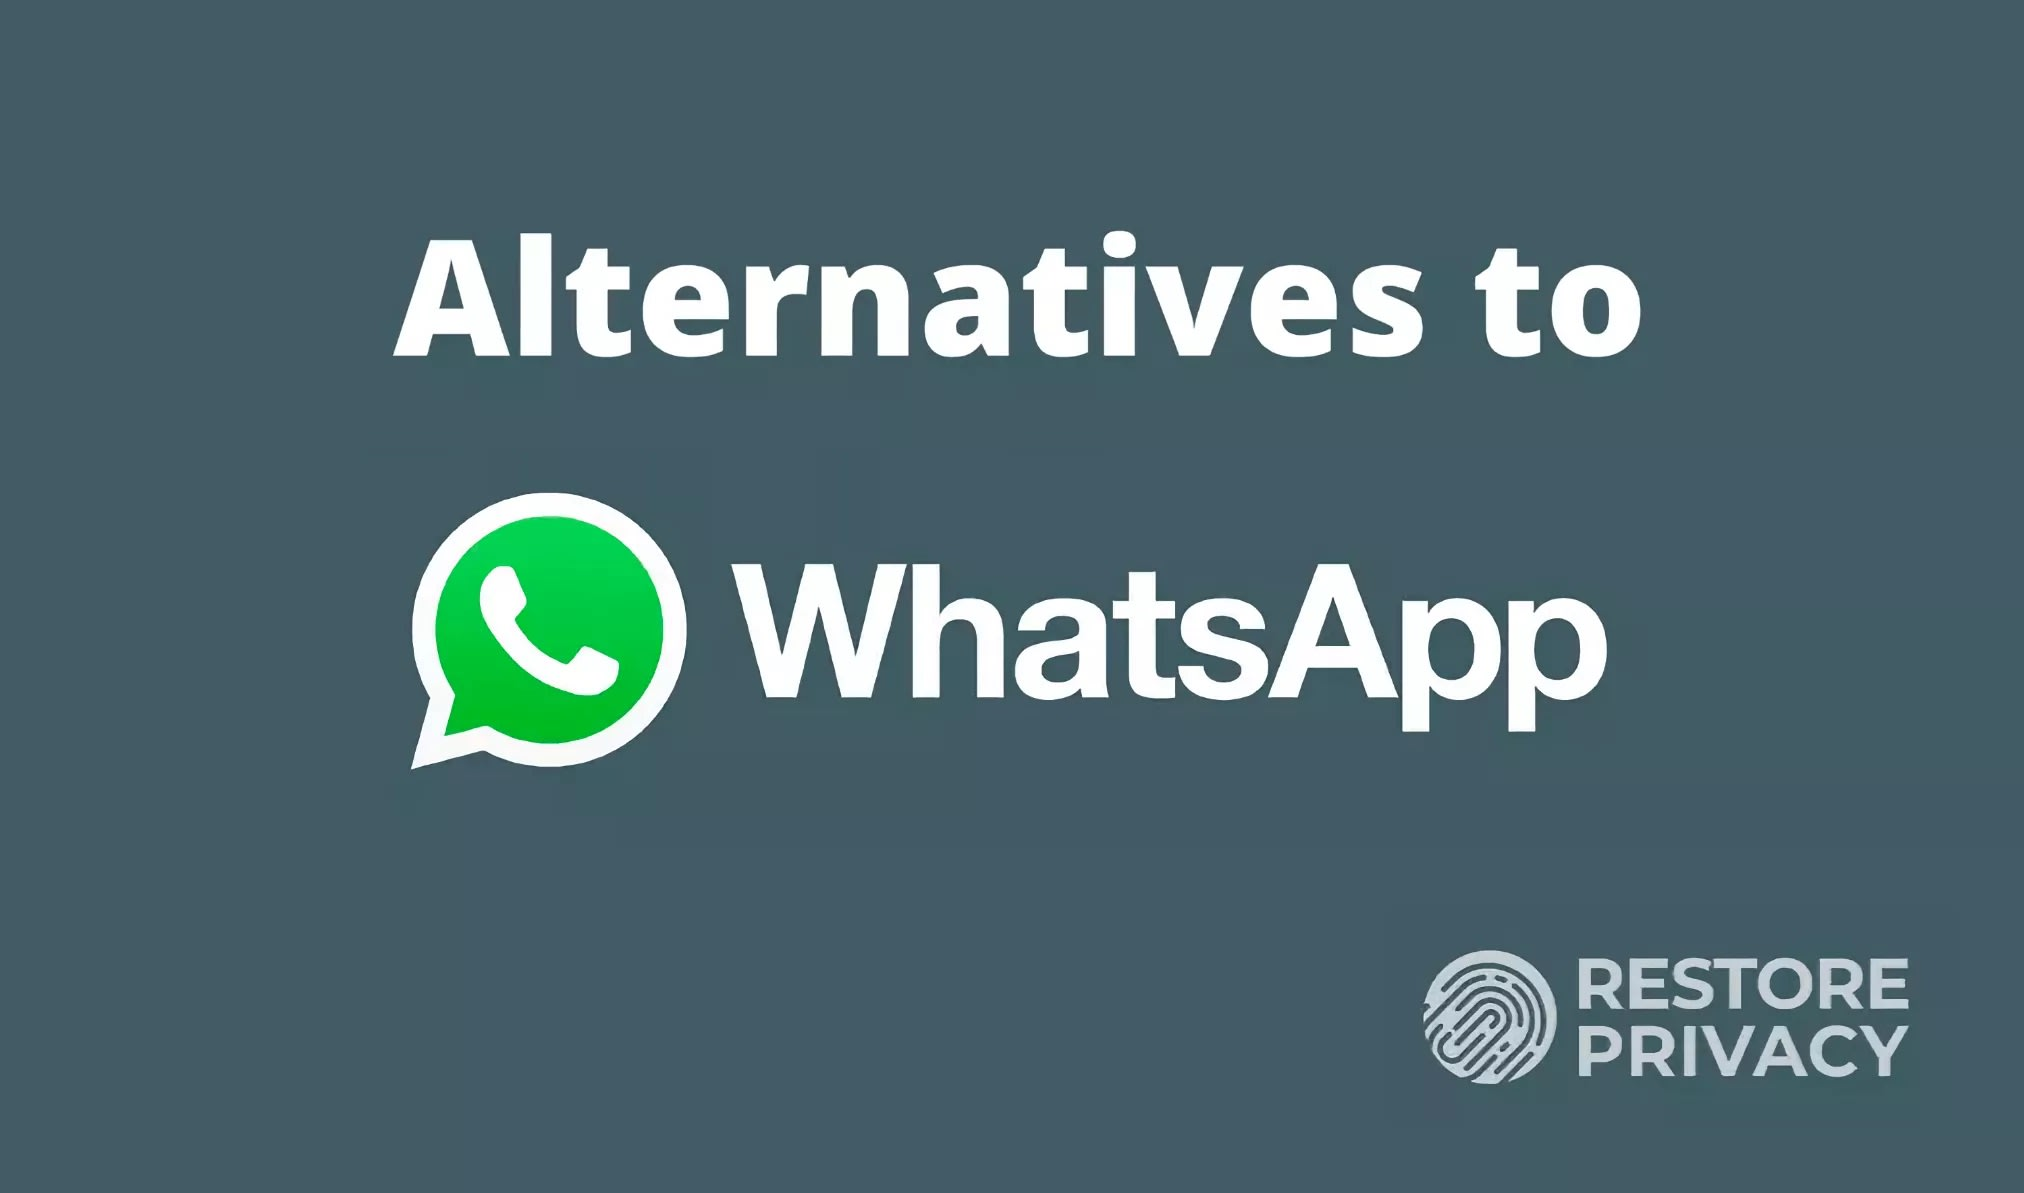 New WhatsApp Privacy Policy Update 2021 European Region, WhatsApp Alerts 2021